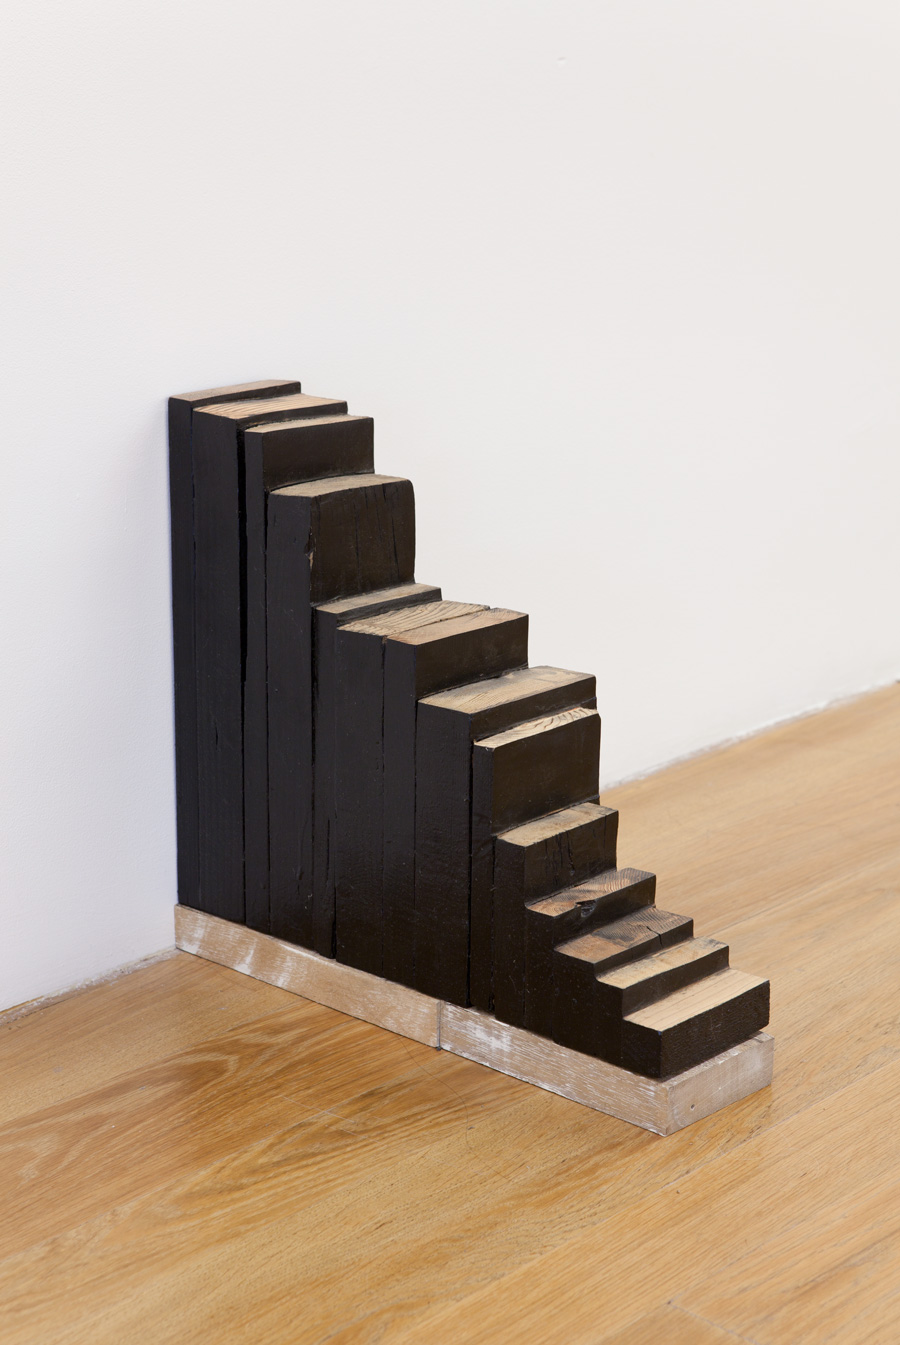 Cutting Edge , 1996 端切 ( Tansetsu ) Wood, acrylic 15 x 4 3/8 x 16 1/2 inches 38 x 11 x 42 cm